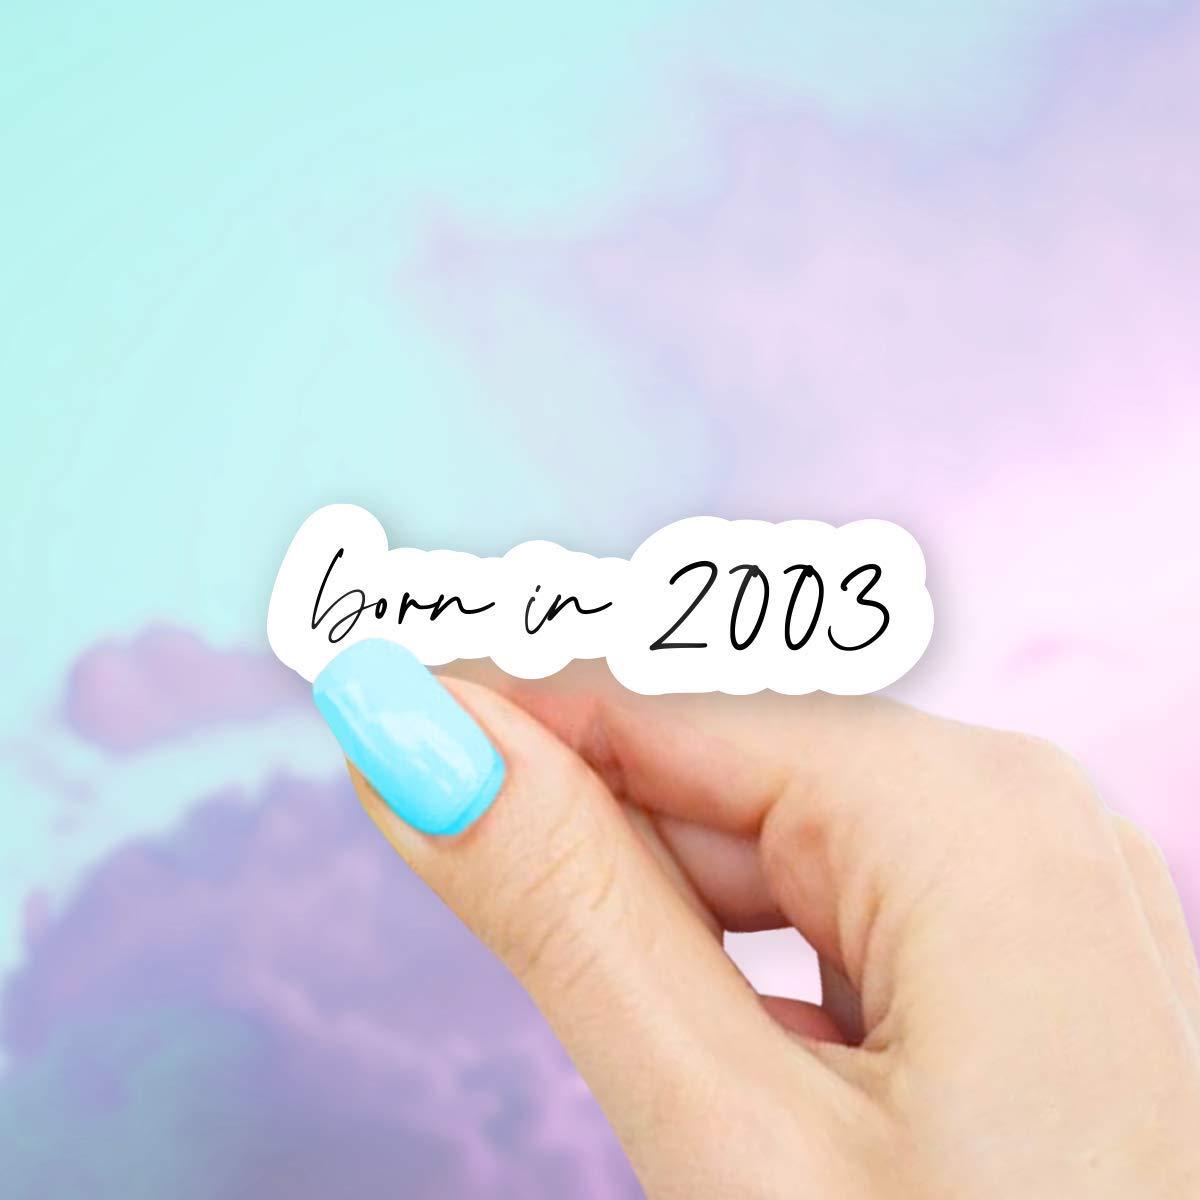 Born In 2003 Vinyl Sticker for Laptops Windows and Water Bottles